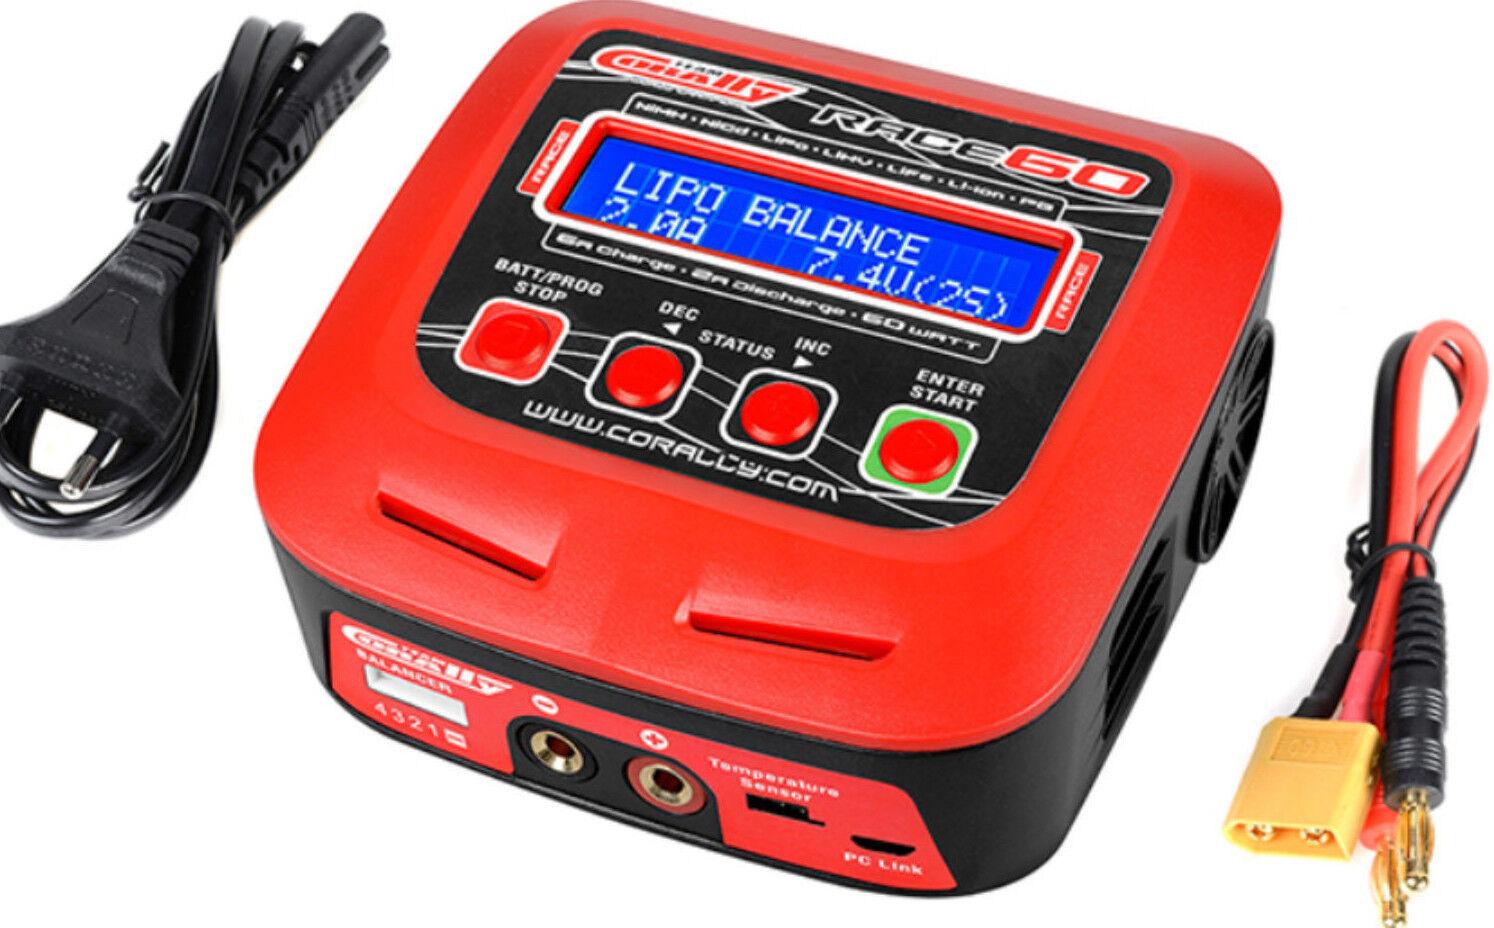 Squadra Cortuttiy autoicatore Race 60 autoicabatteria  Ac-Dc 60W energia 2-4 li 6-8 Ni  incentivi promozionali